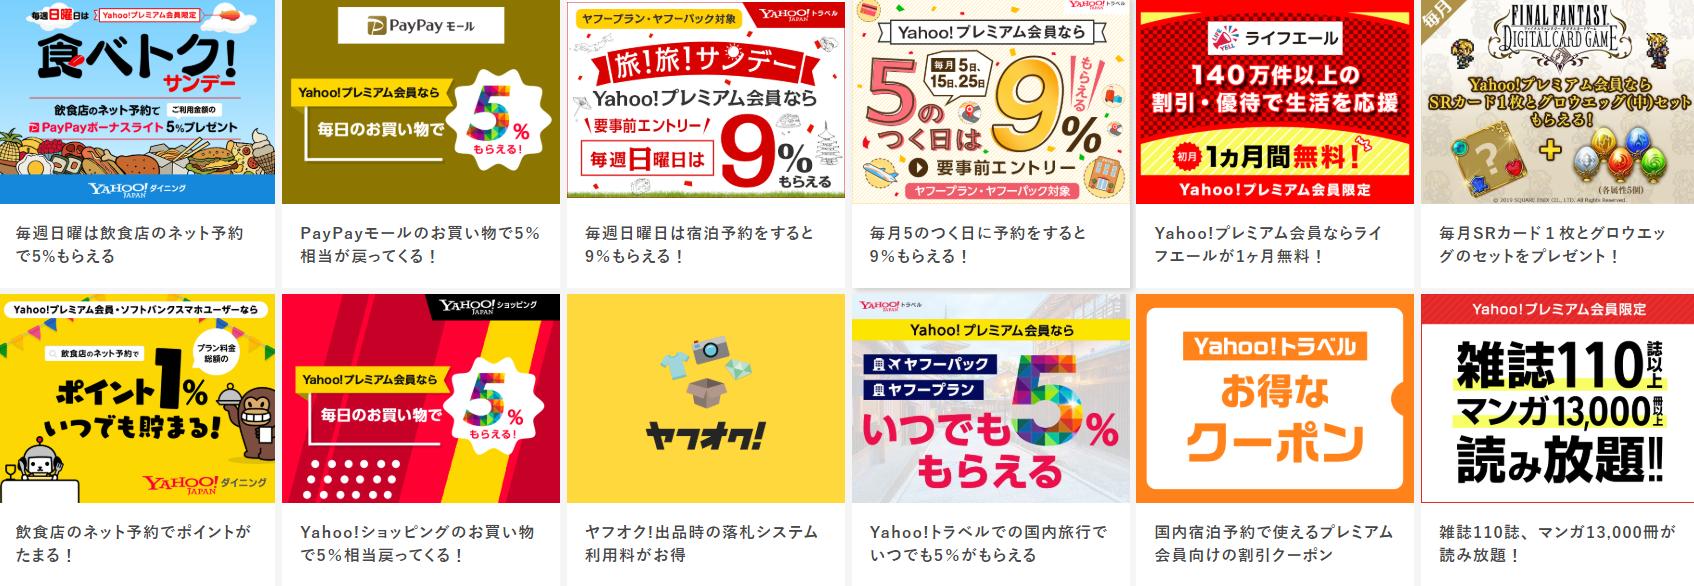 Yahoo!プレミアム会員特典①